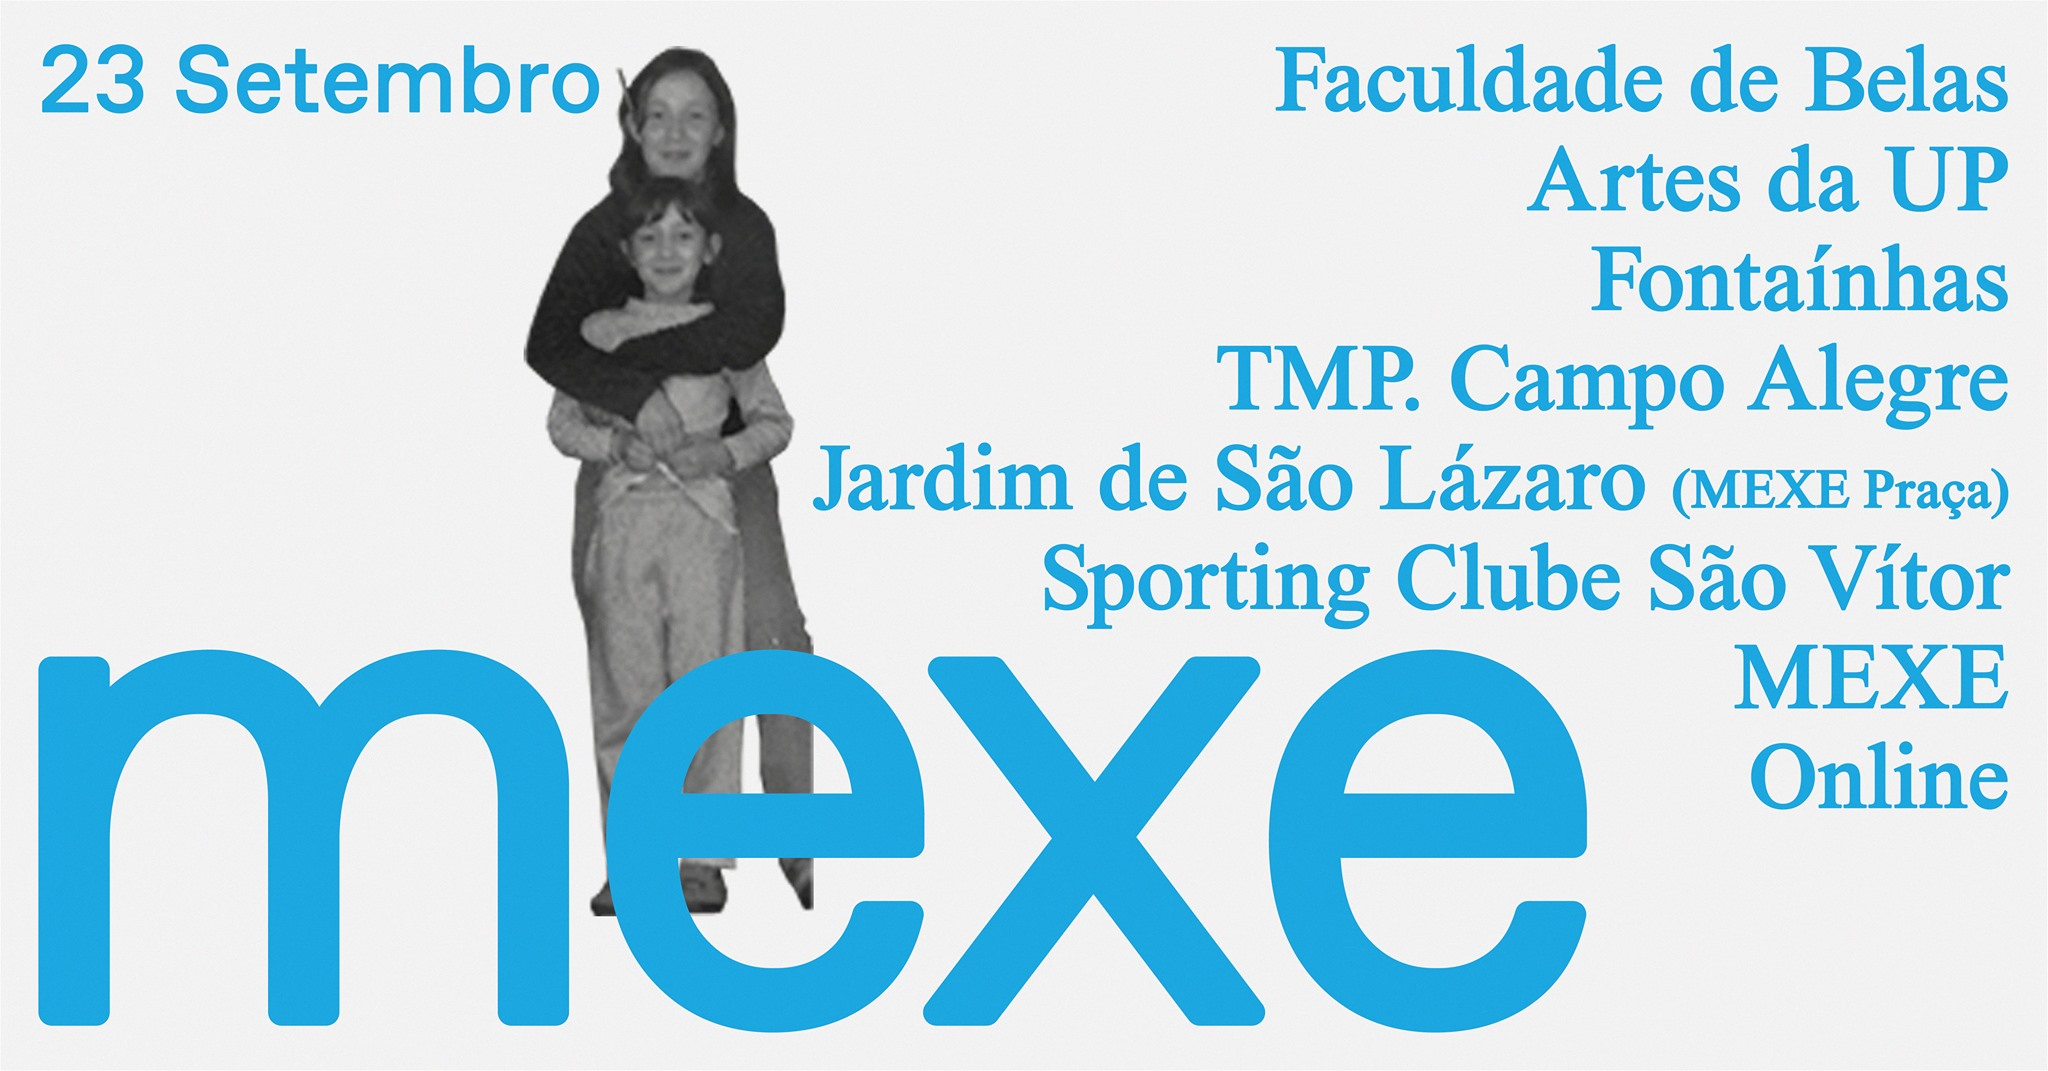 MEXE | 23 Setembro